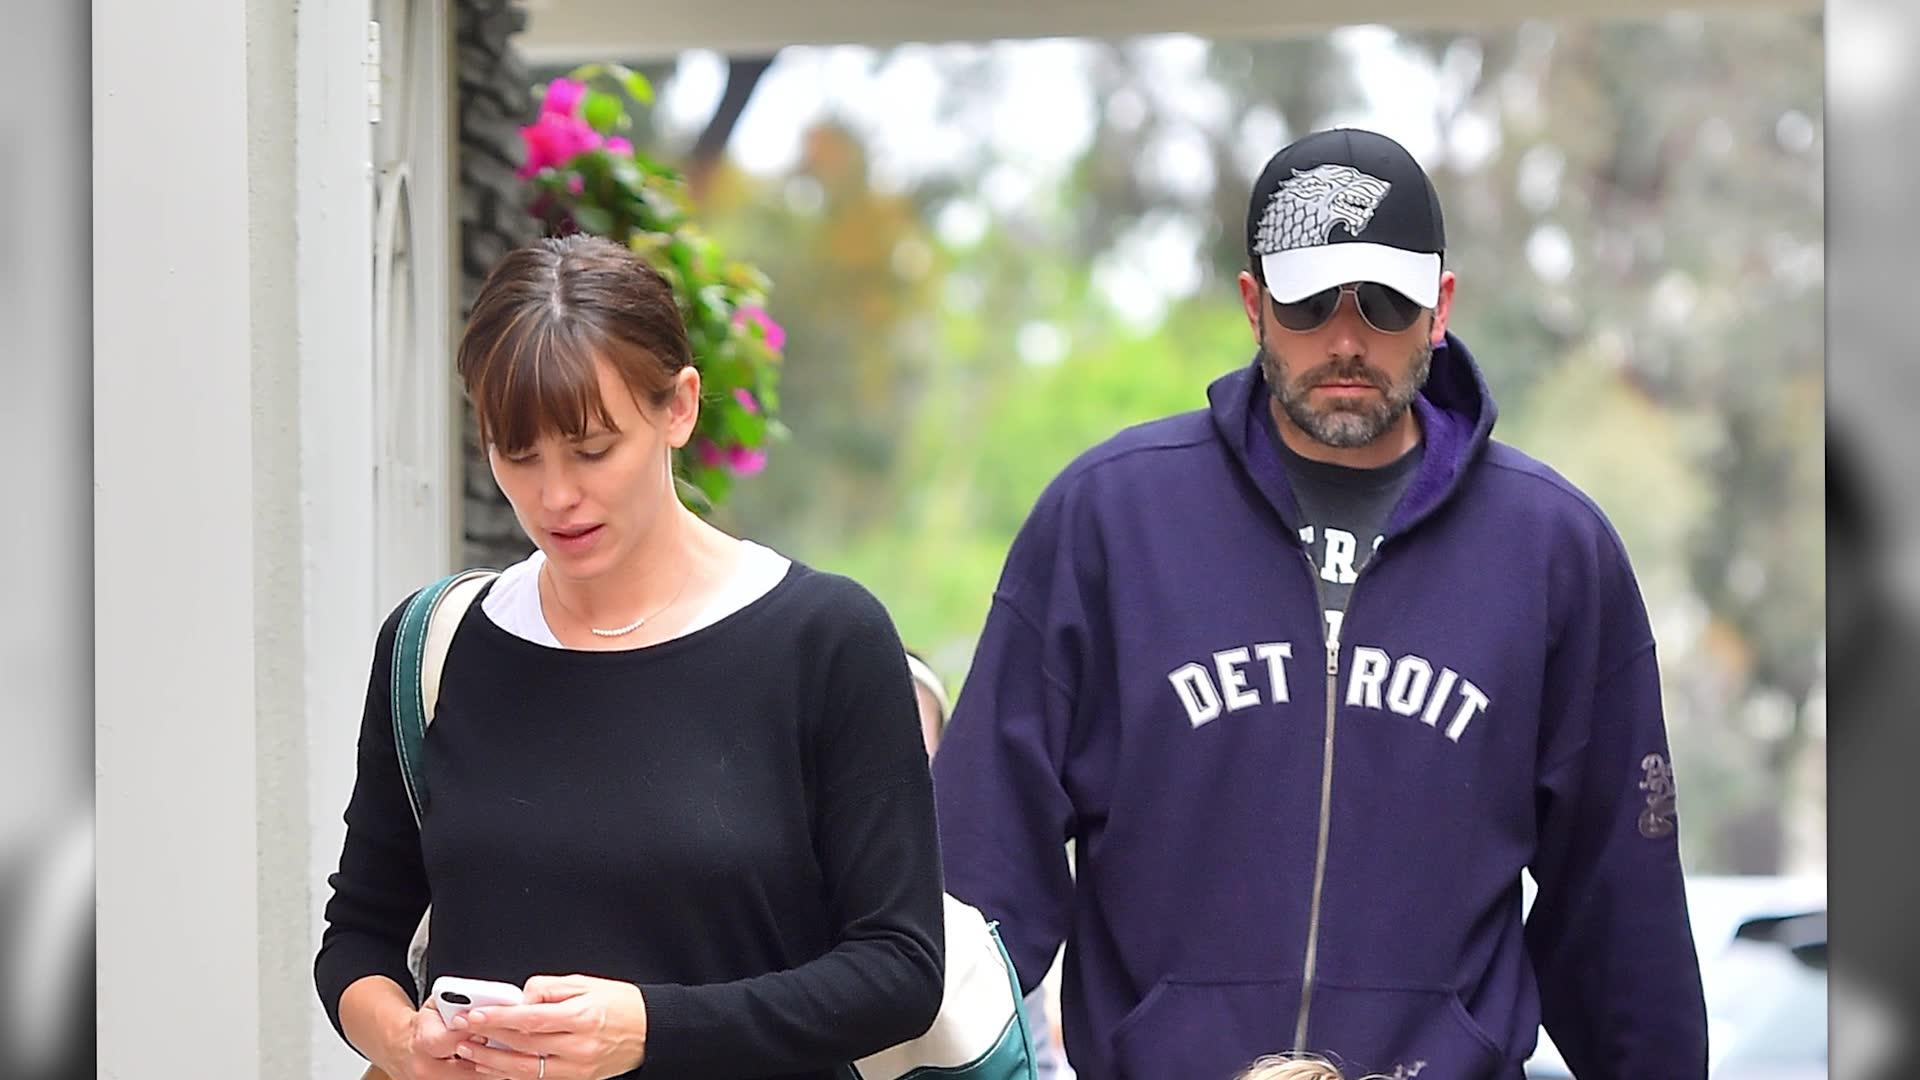 Is Ben Affleck and Jennifer Garner's Split Imminent?